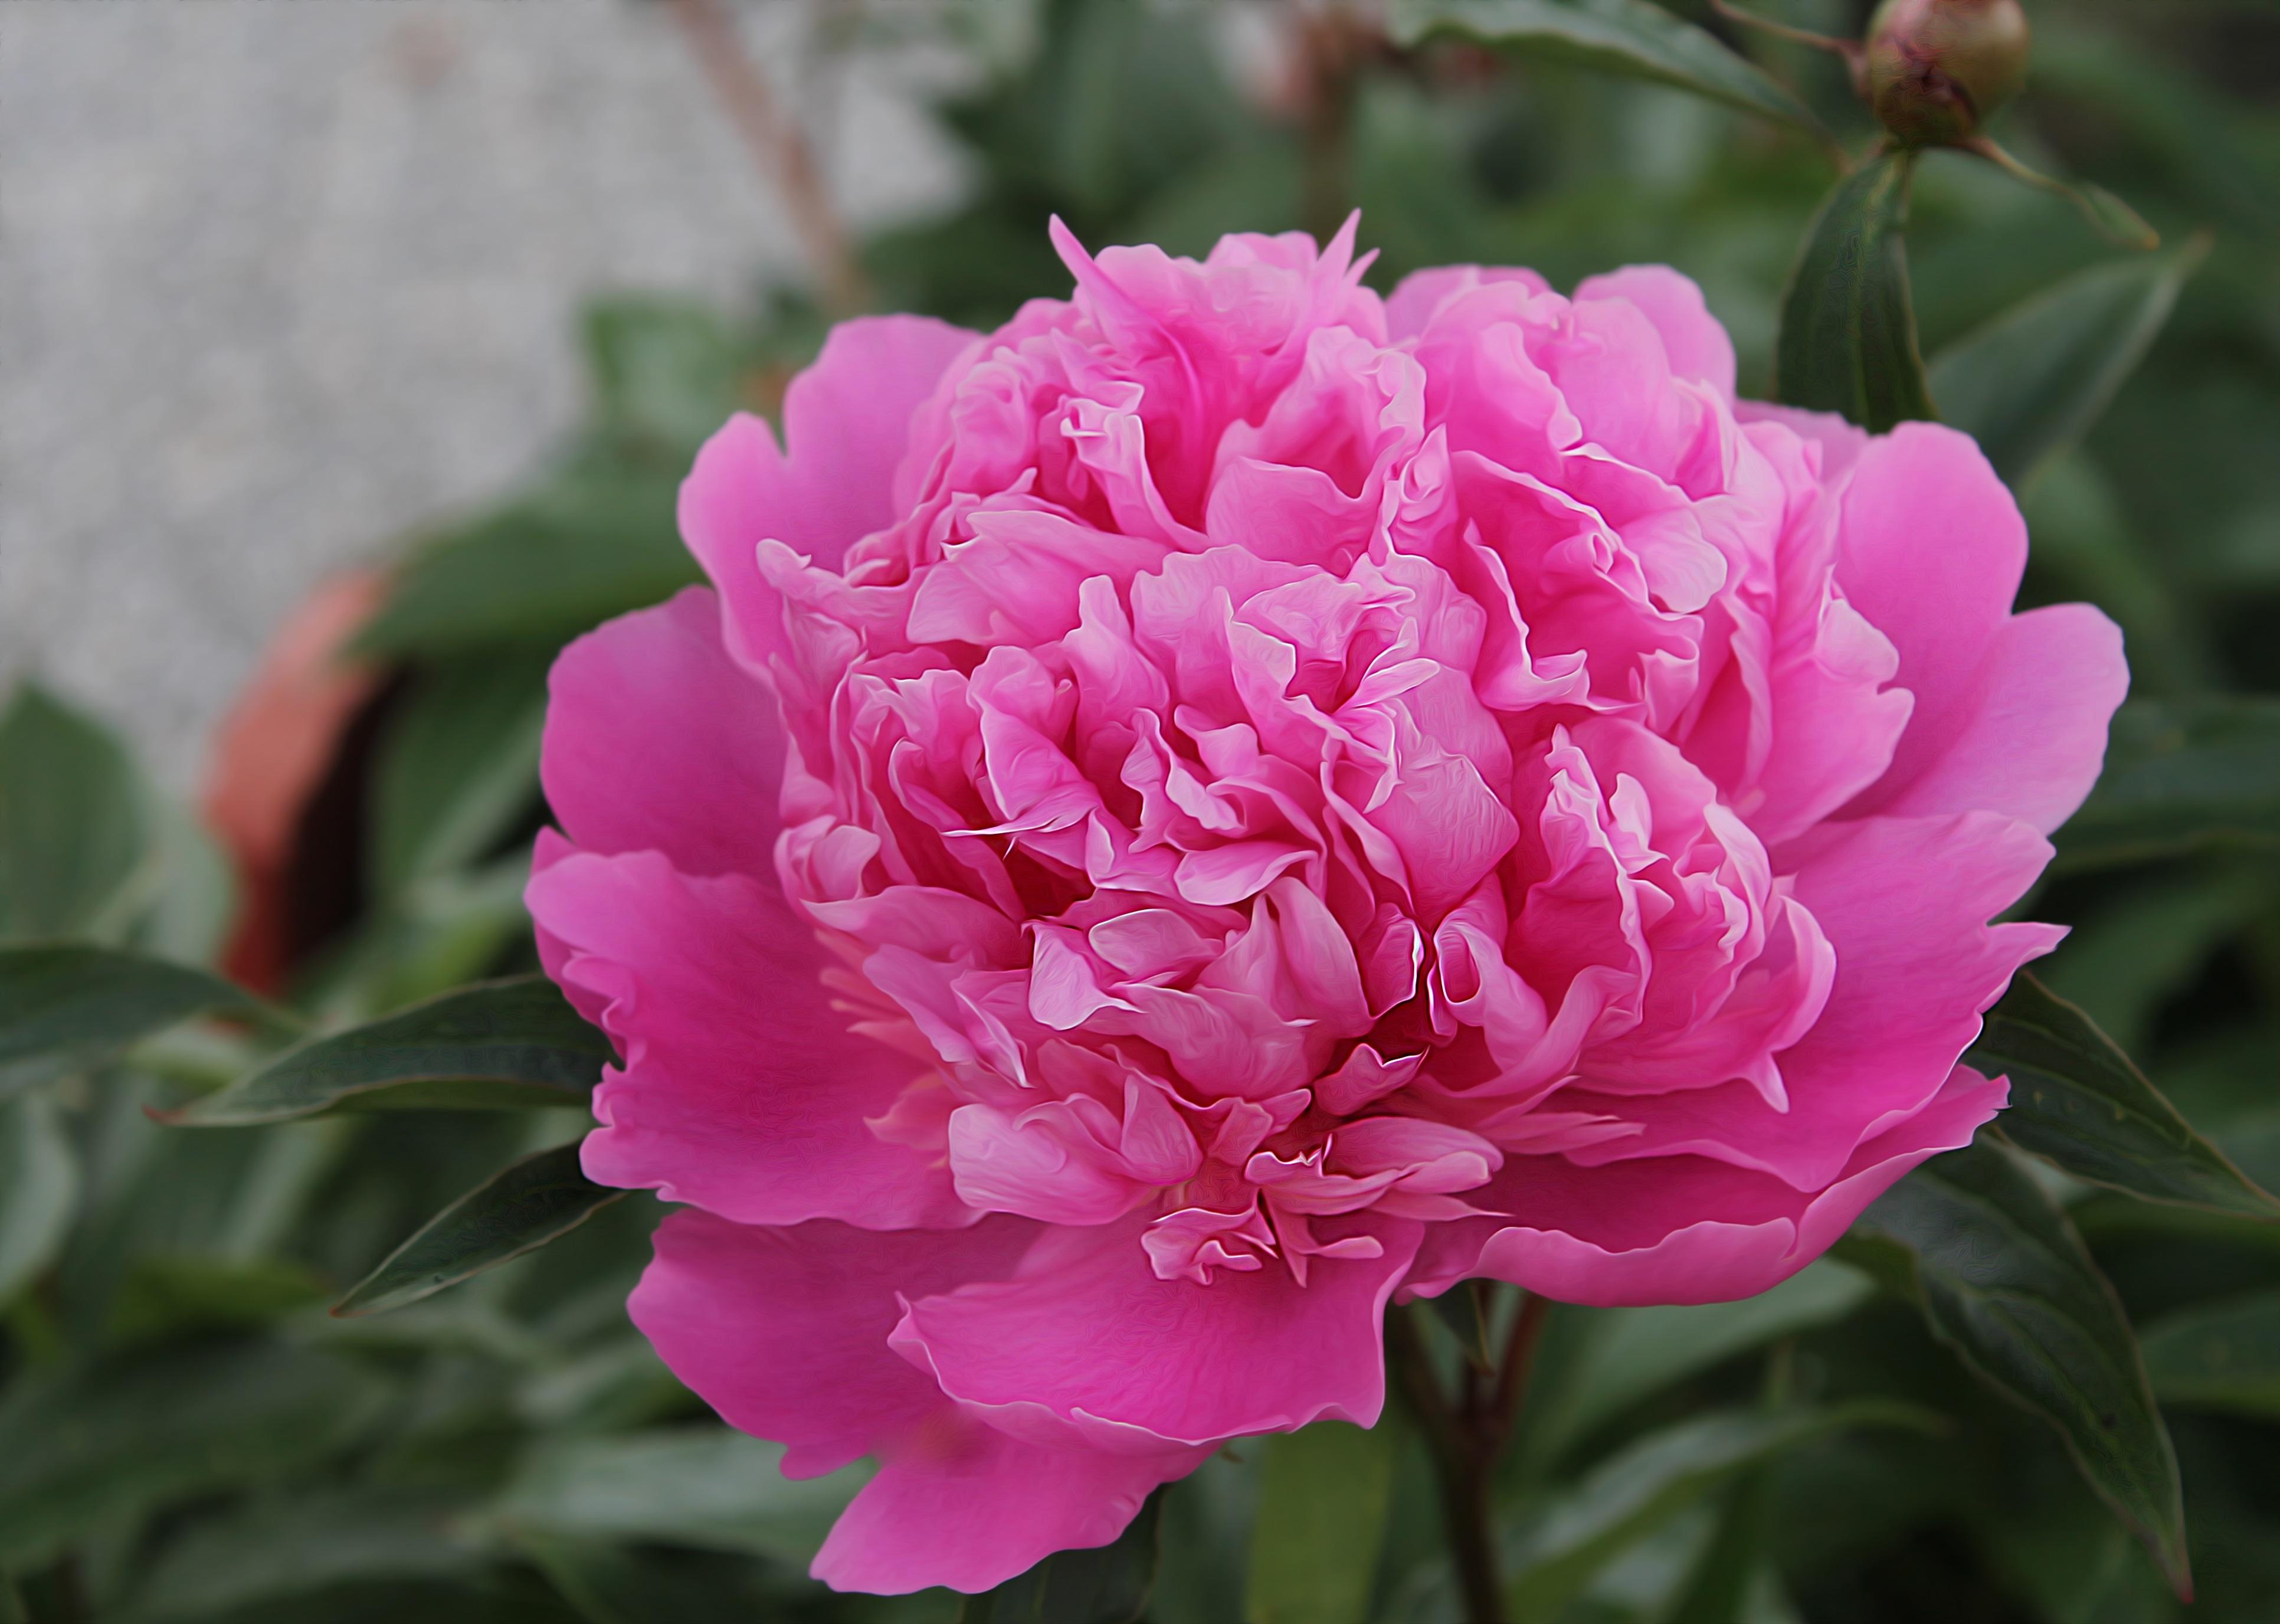 Free Images Blossom Petal Summer Flowers Beautiful Peony